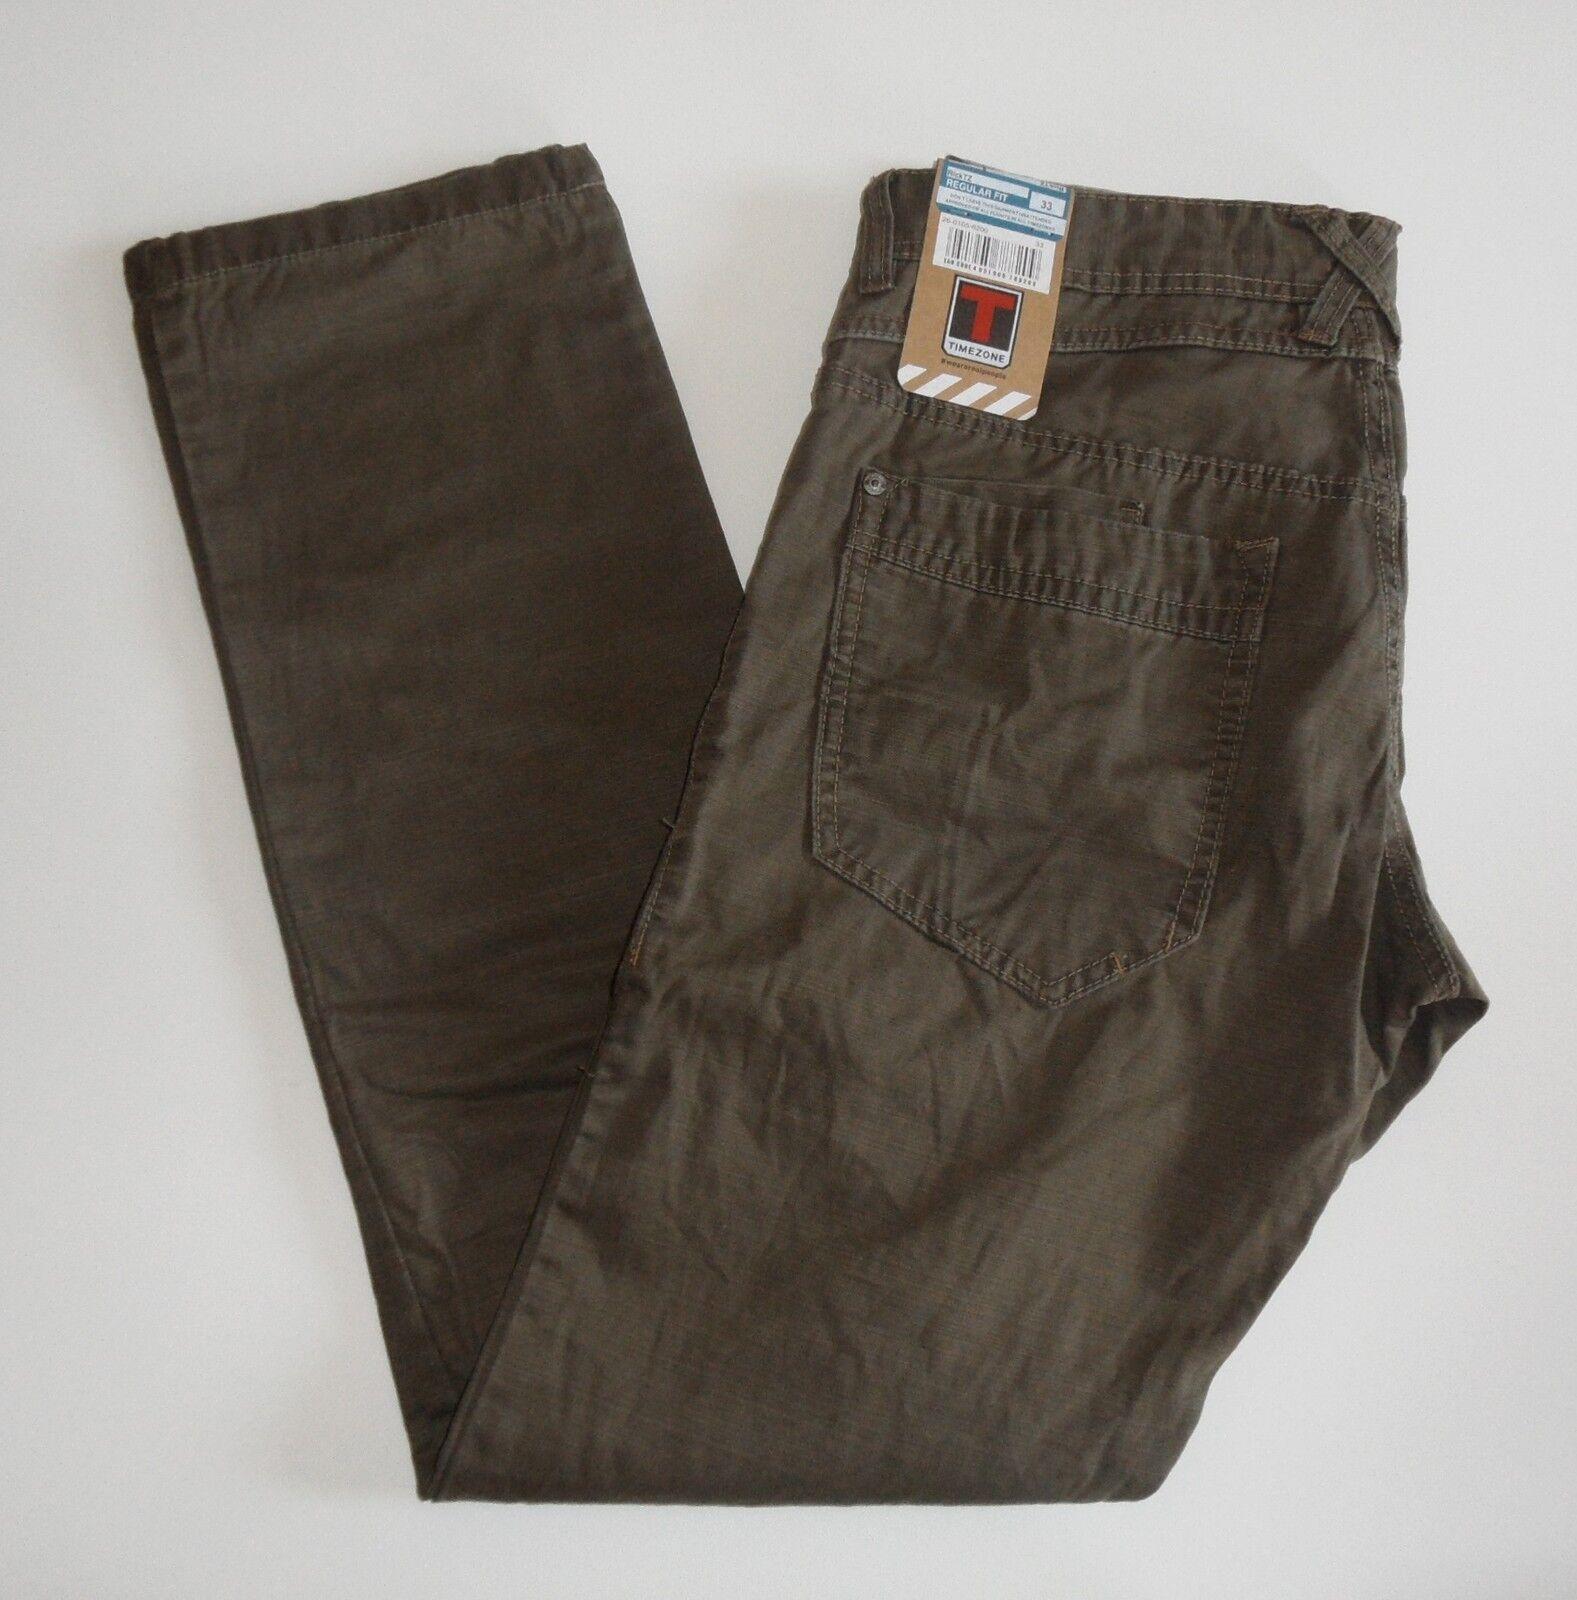 TIMEZONE Uomo Worker Pantaloni Rick 26-0105 Dark Dark Dark Earth 6200 diverse dimensioni 836b34